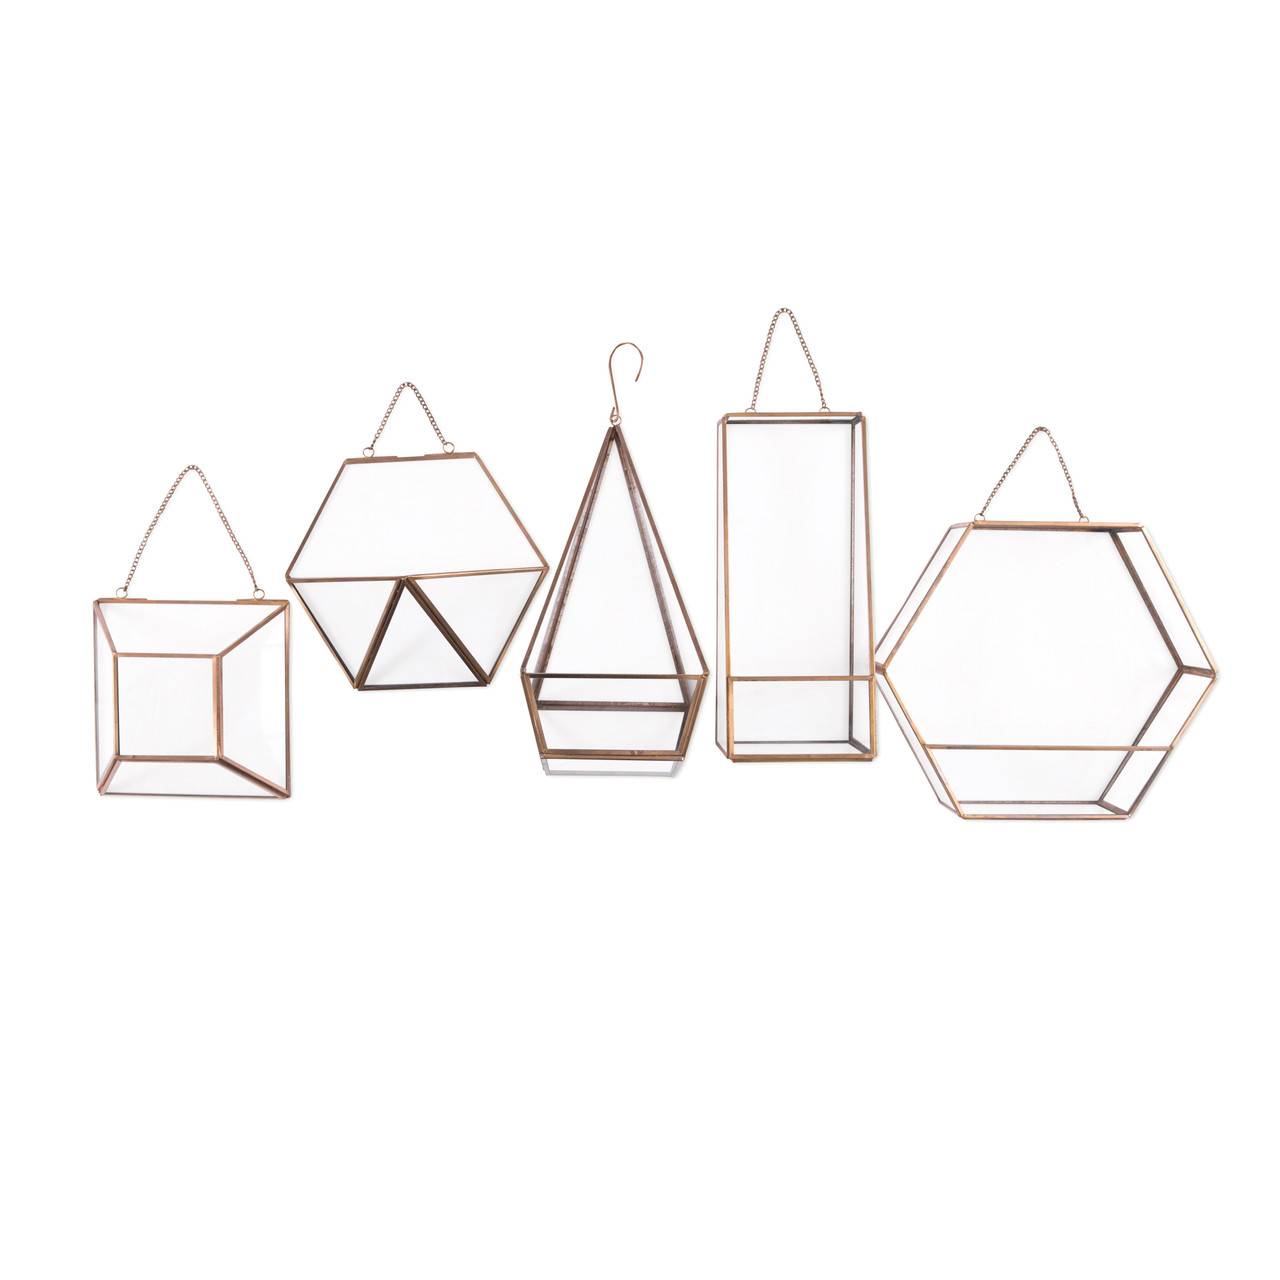 Hanging Glass Terrariums group